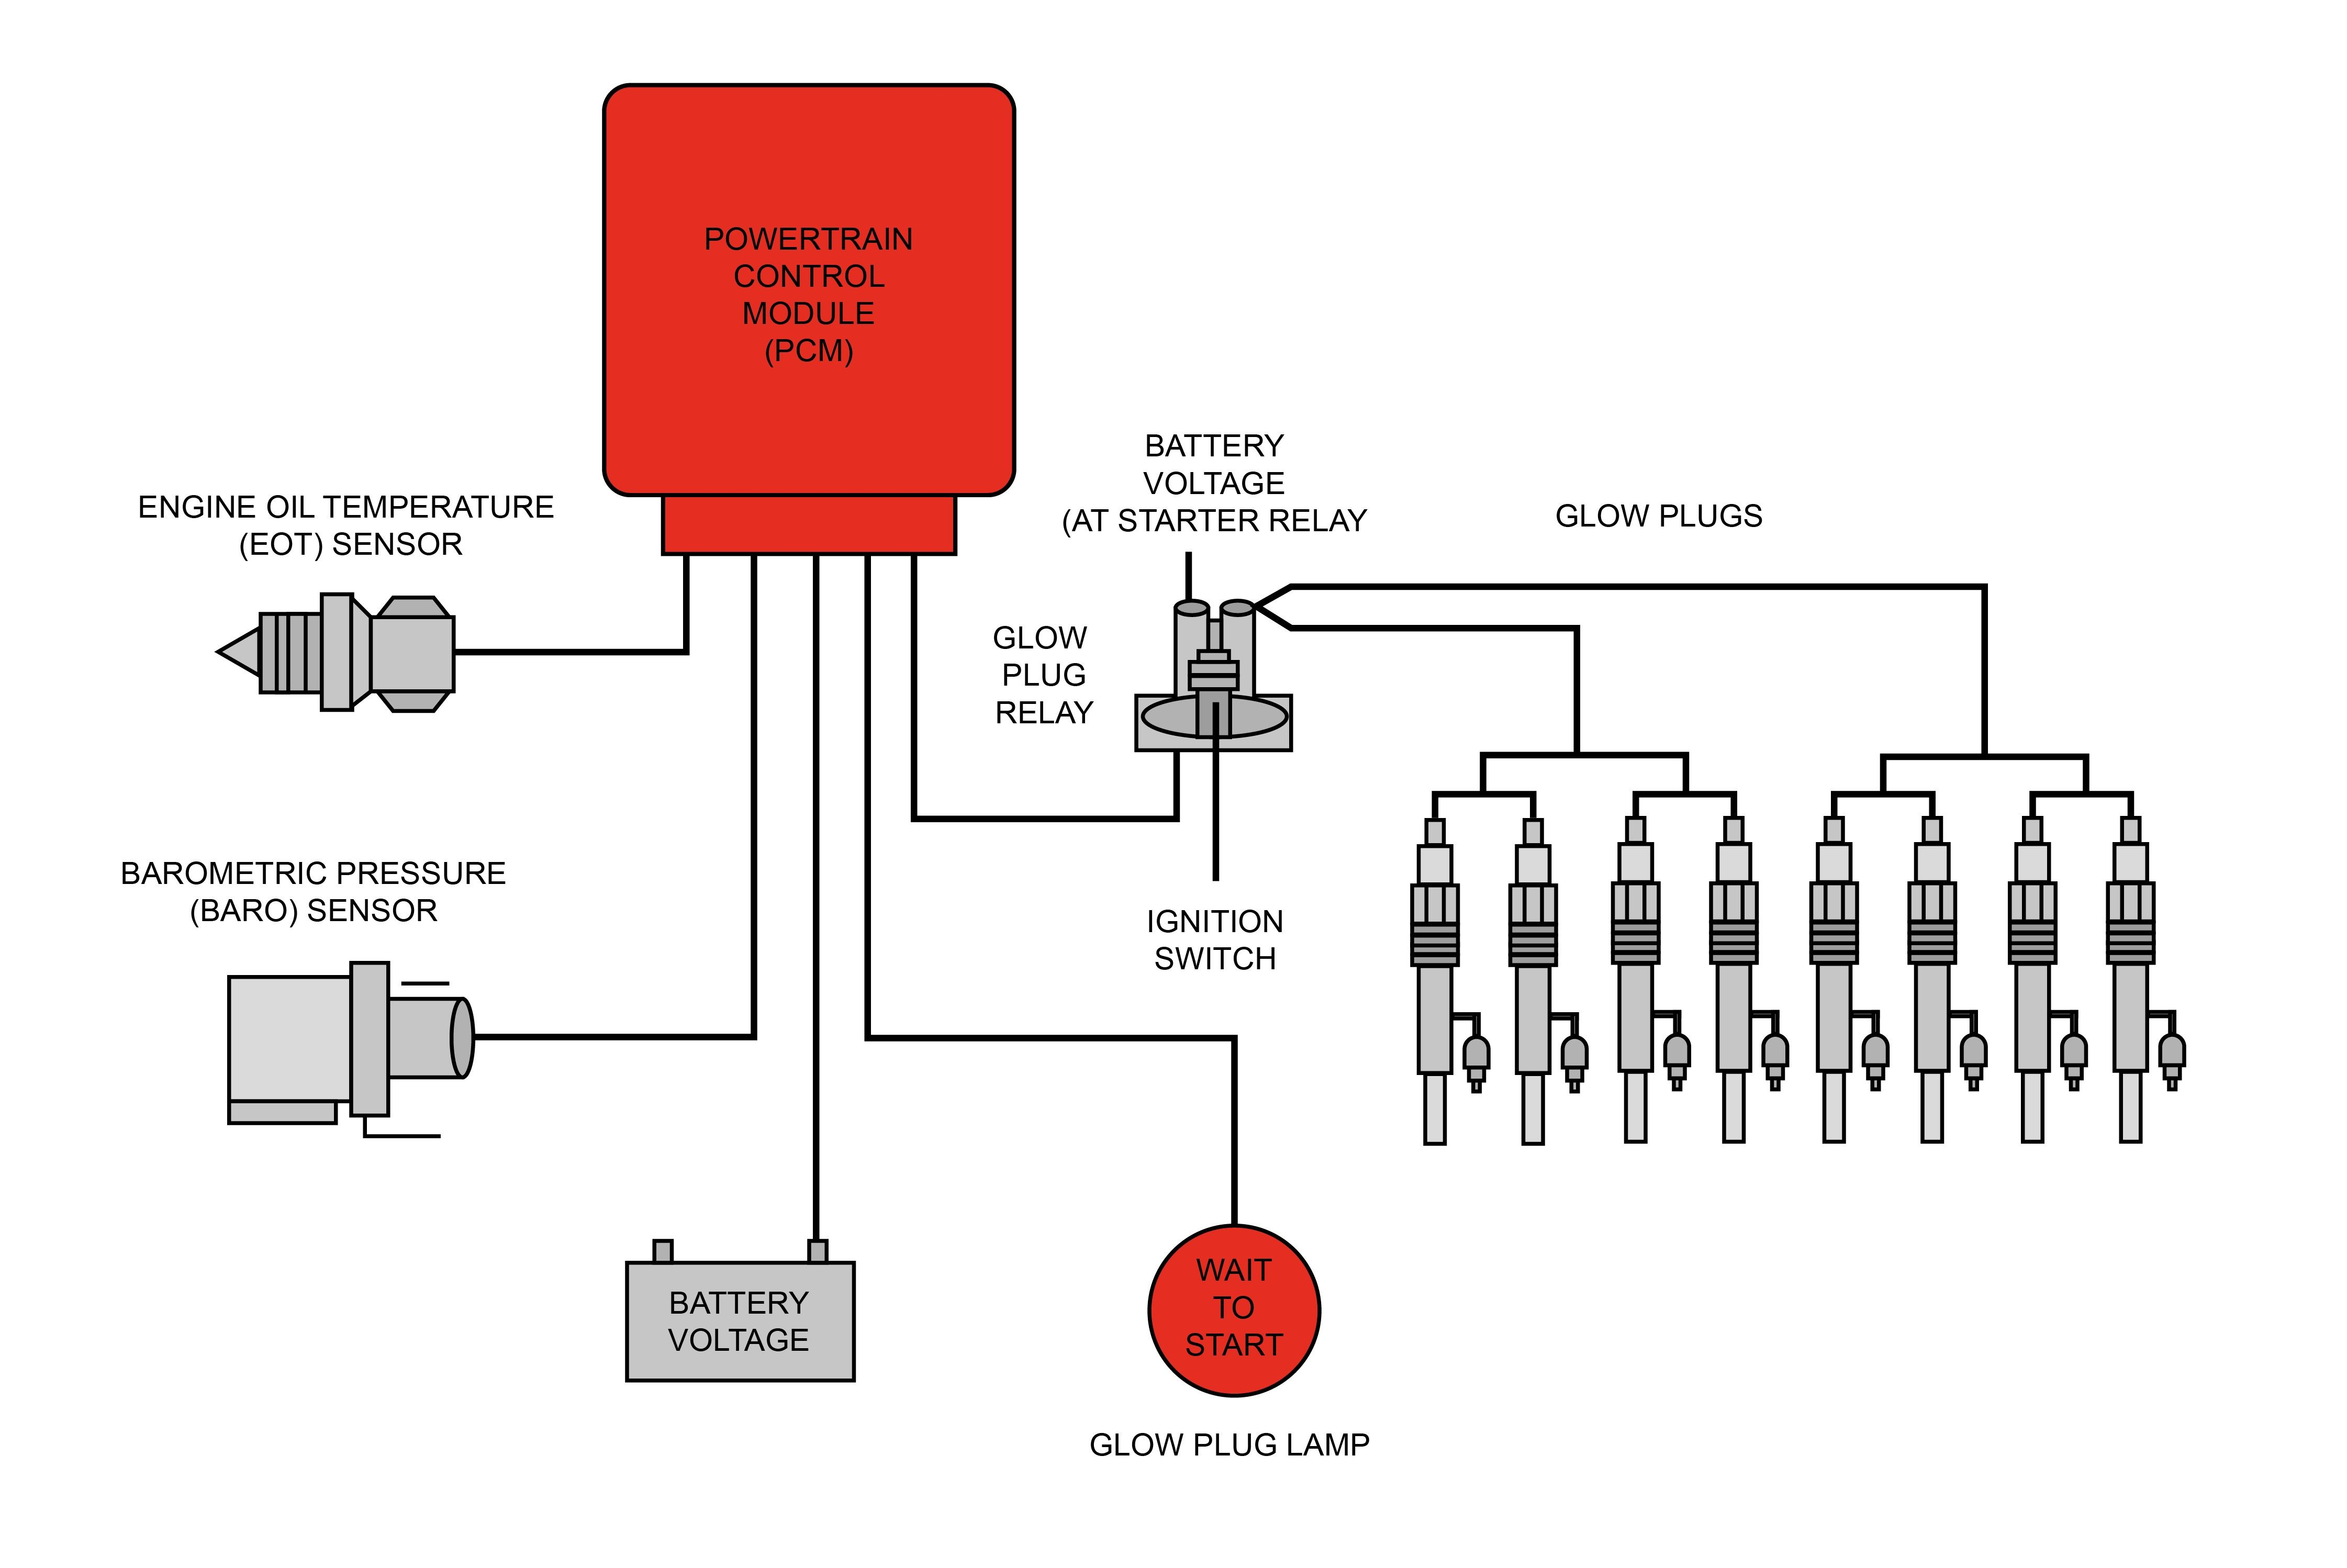 7 3 Glow Plug Controller Diagram Awesome Electrical Circuit Diagram Plugs Engine Control Unit